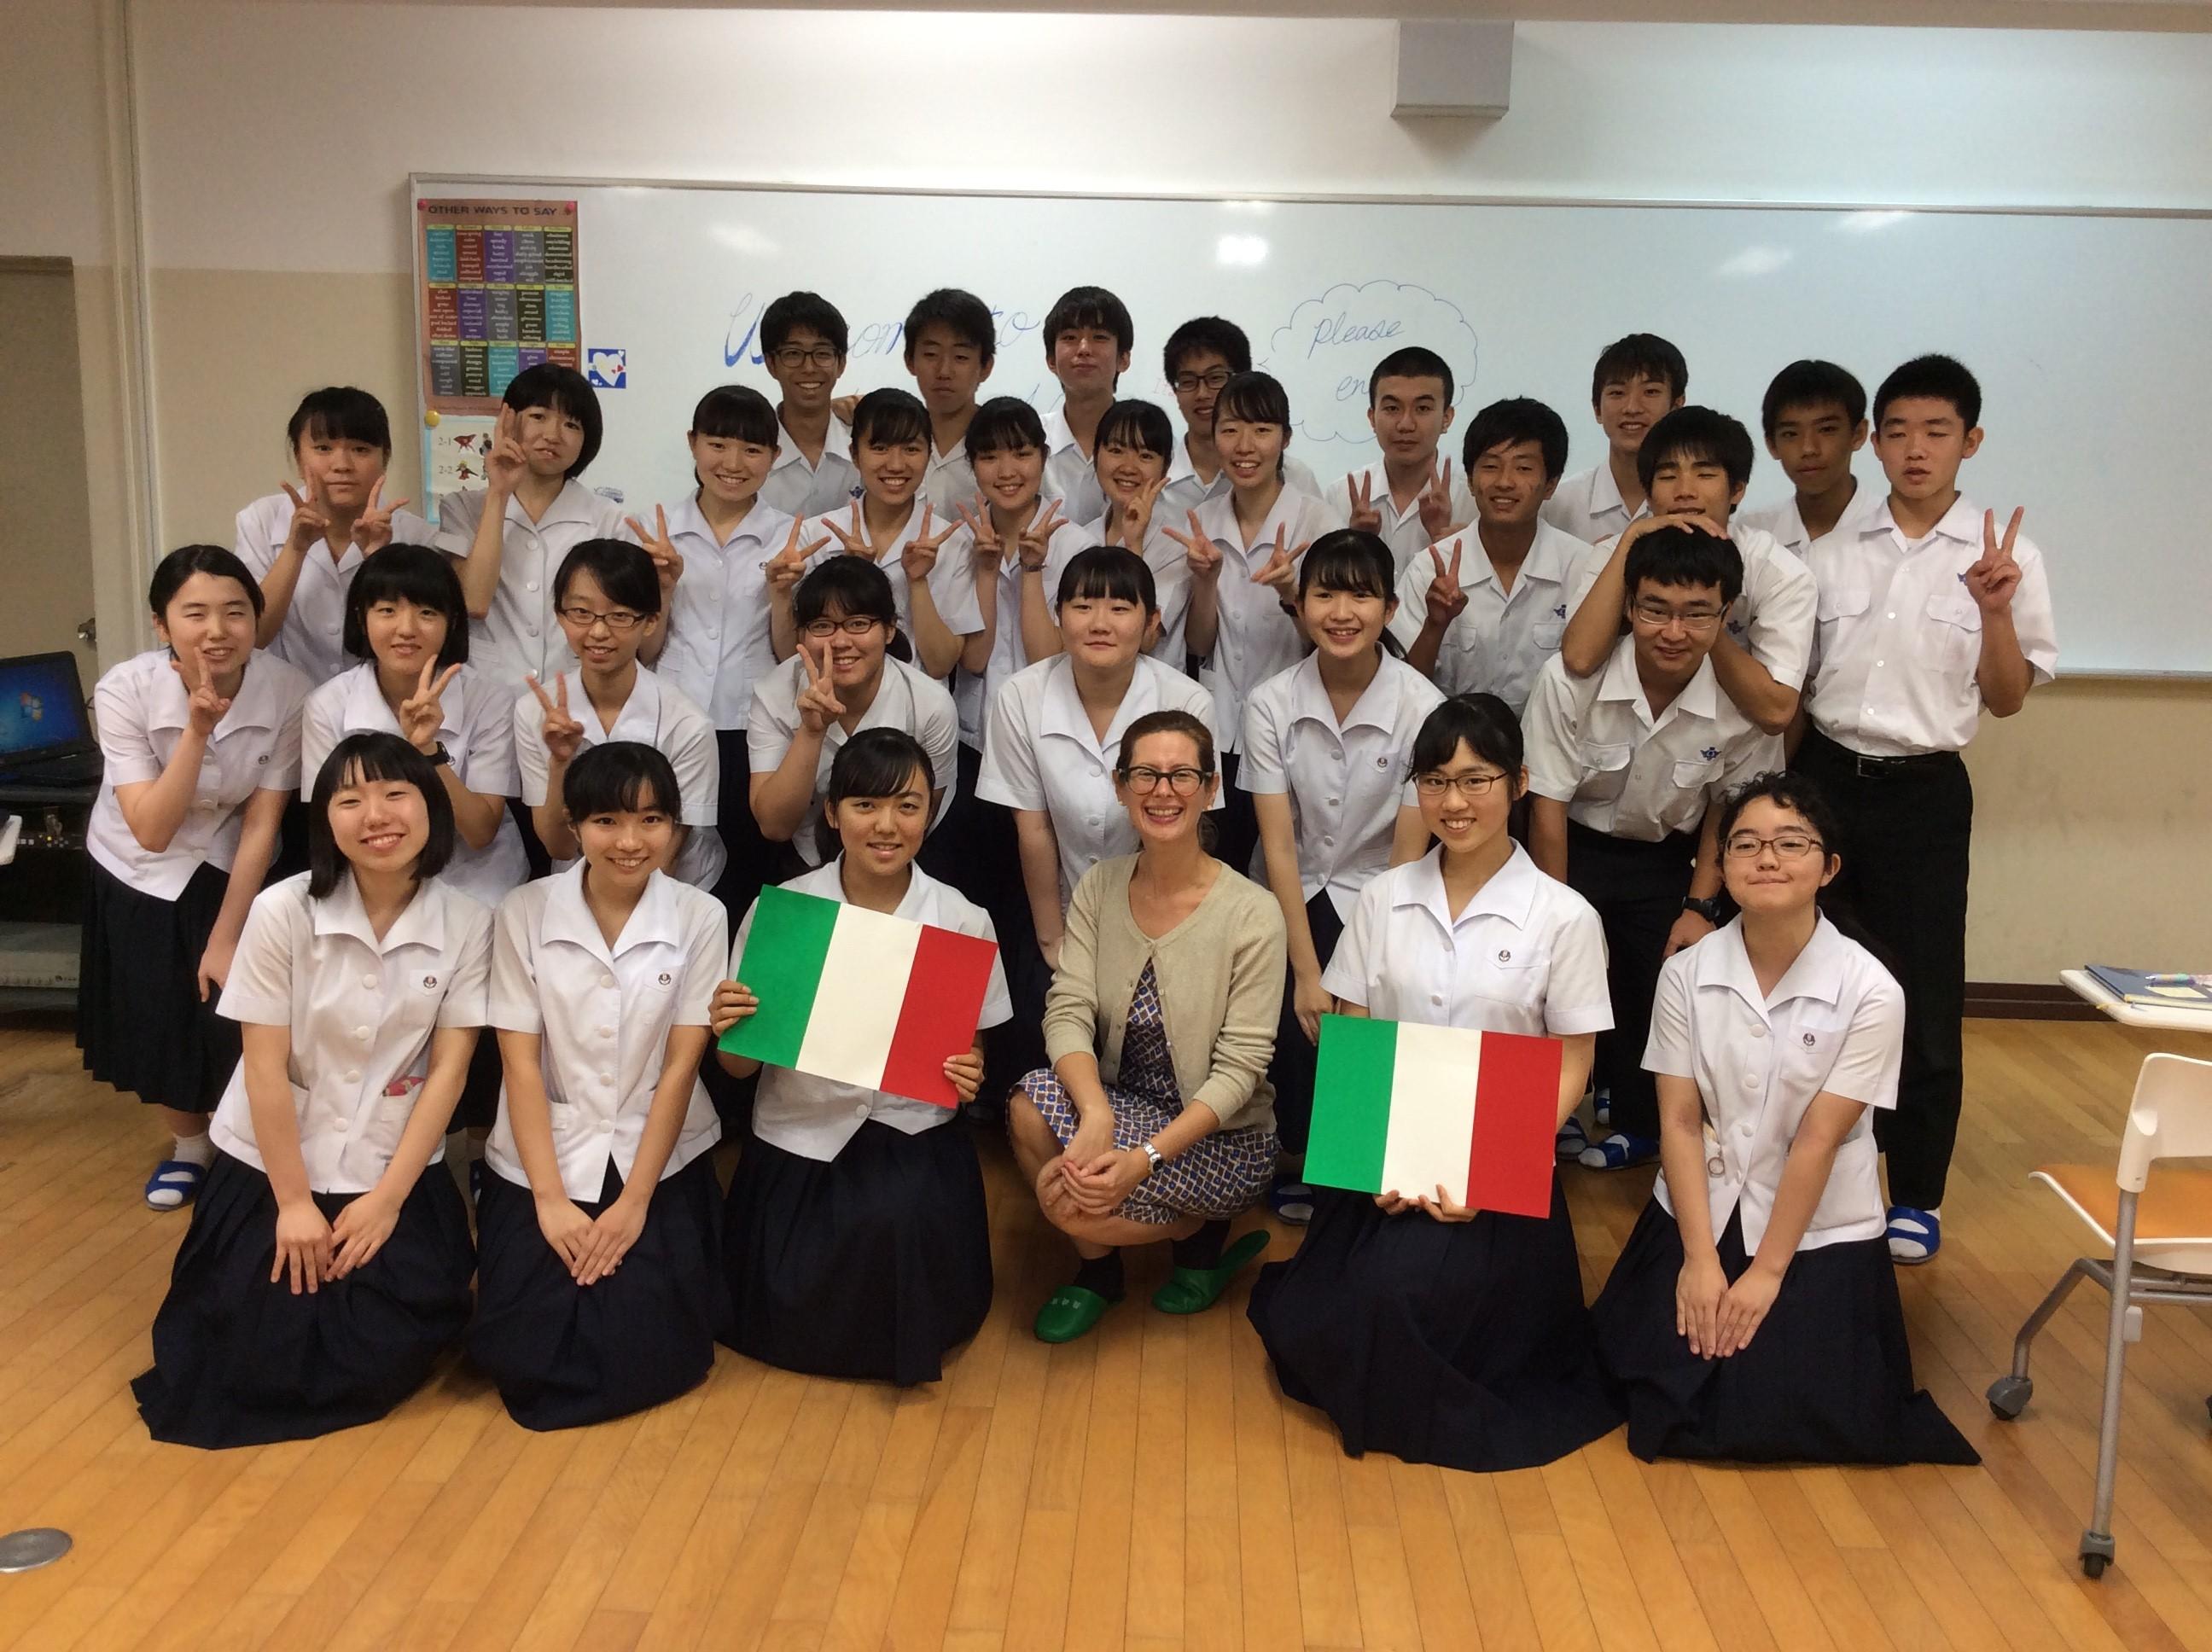 Photo session with Nagasaki Higashi High School students